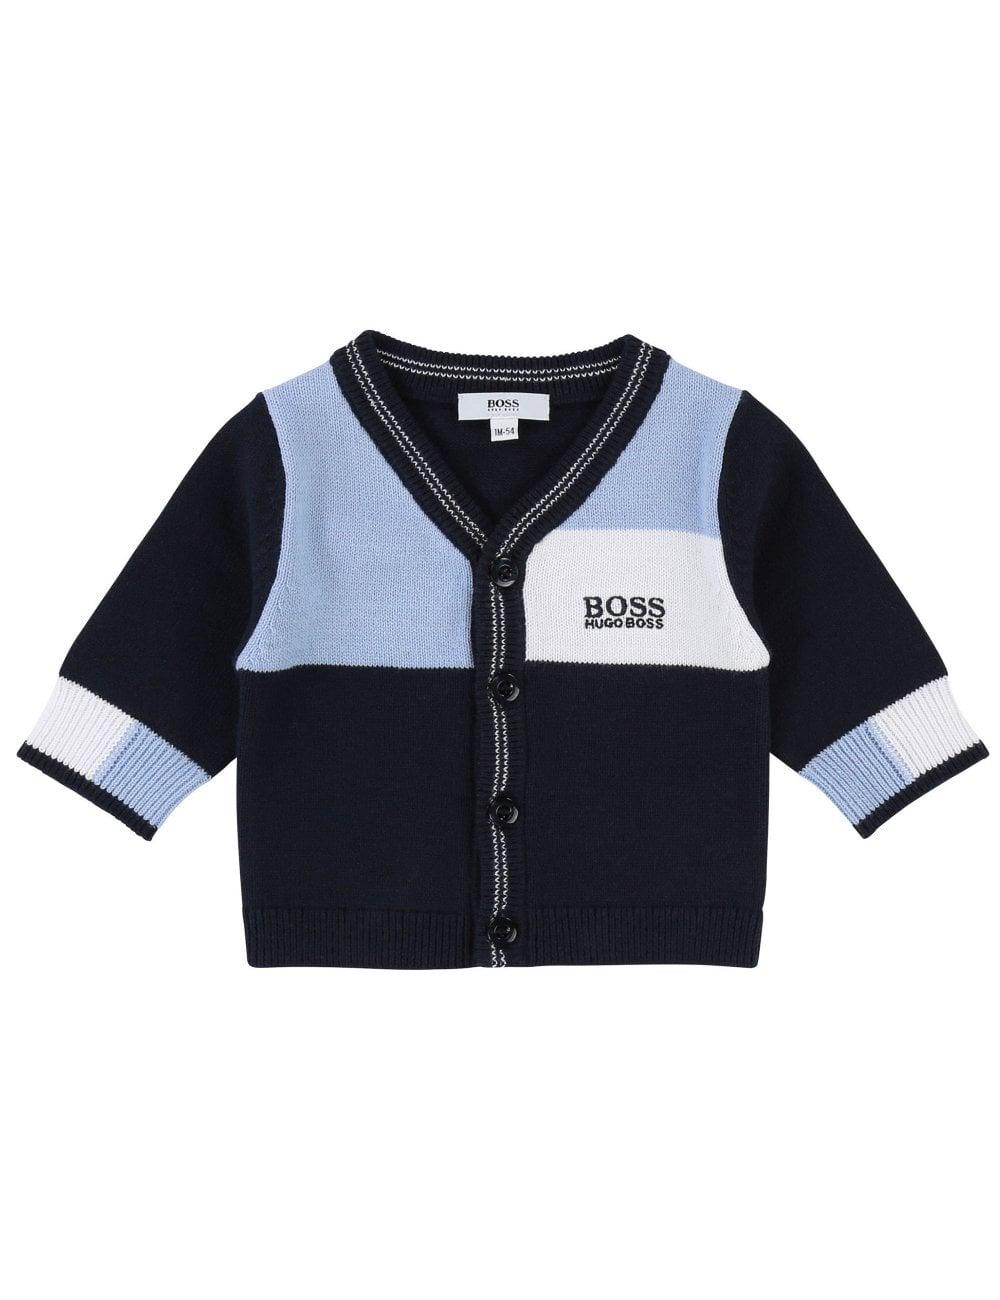 c9c127998 Hugo Boss Kids Baby Boys Knitted Cardigan